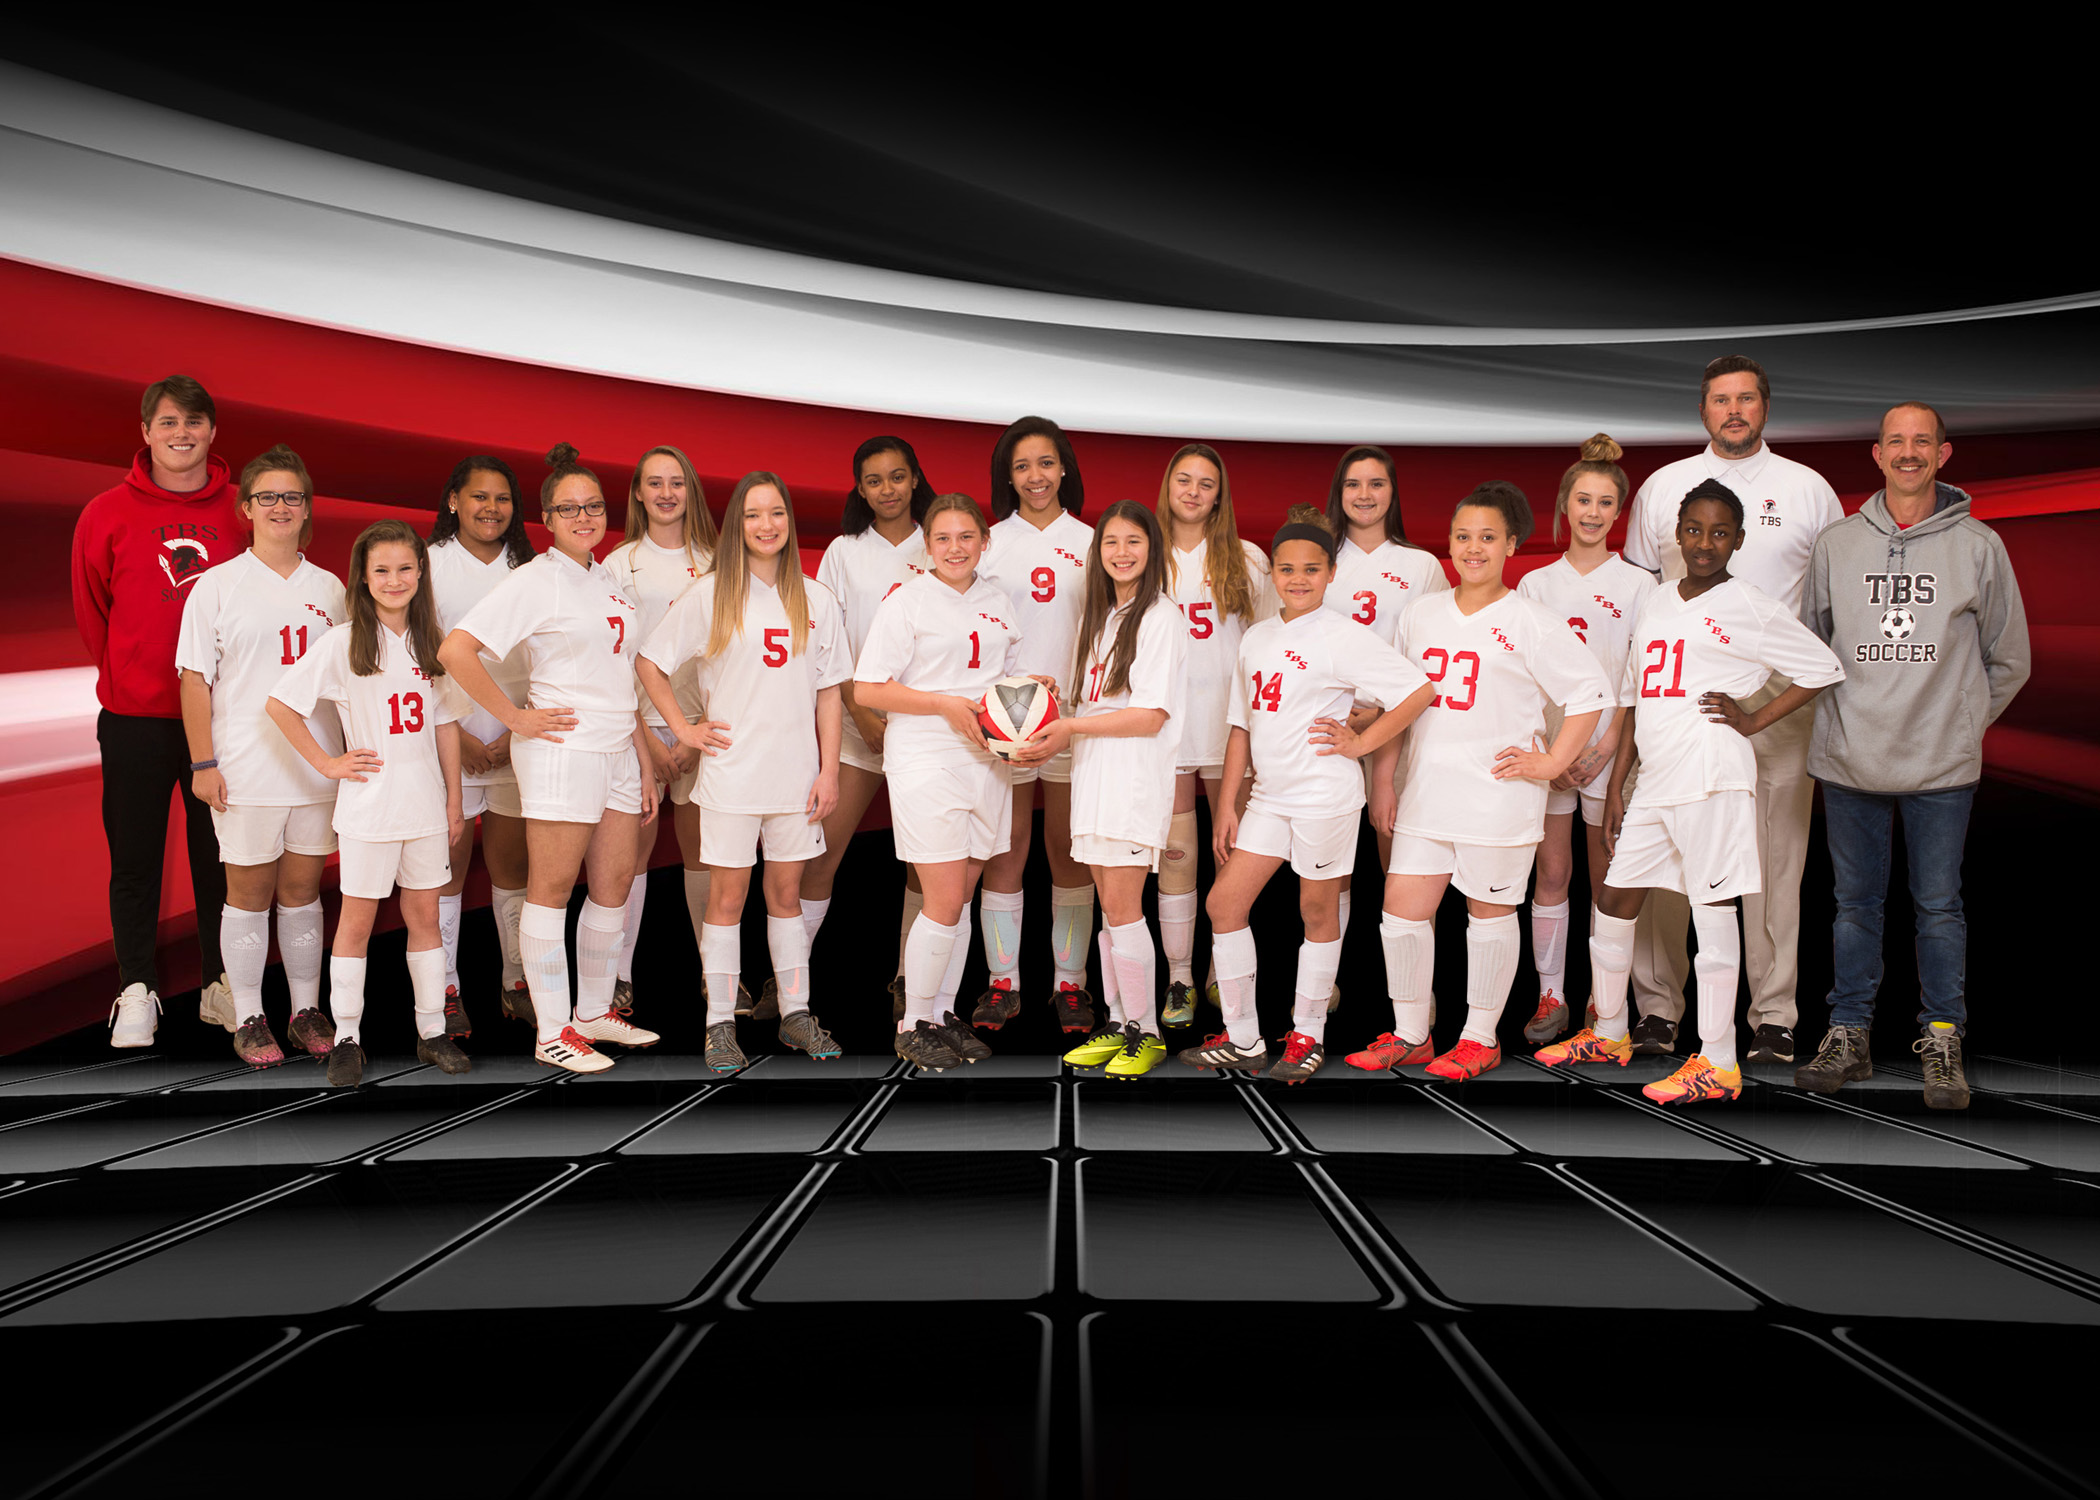 Middle School girls soccer team